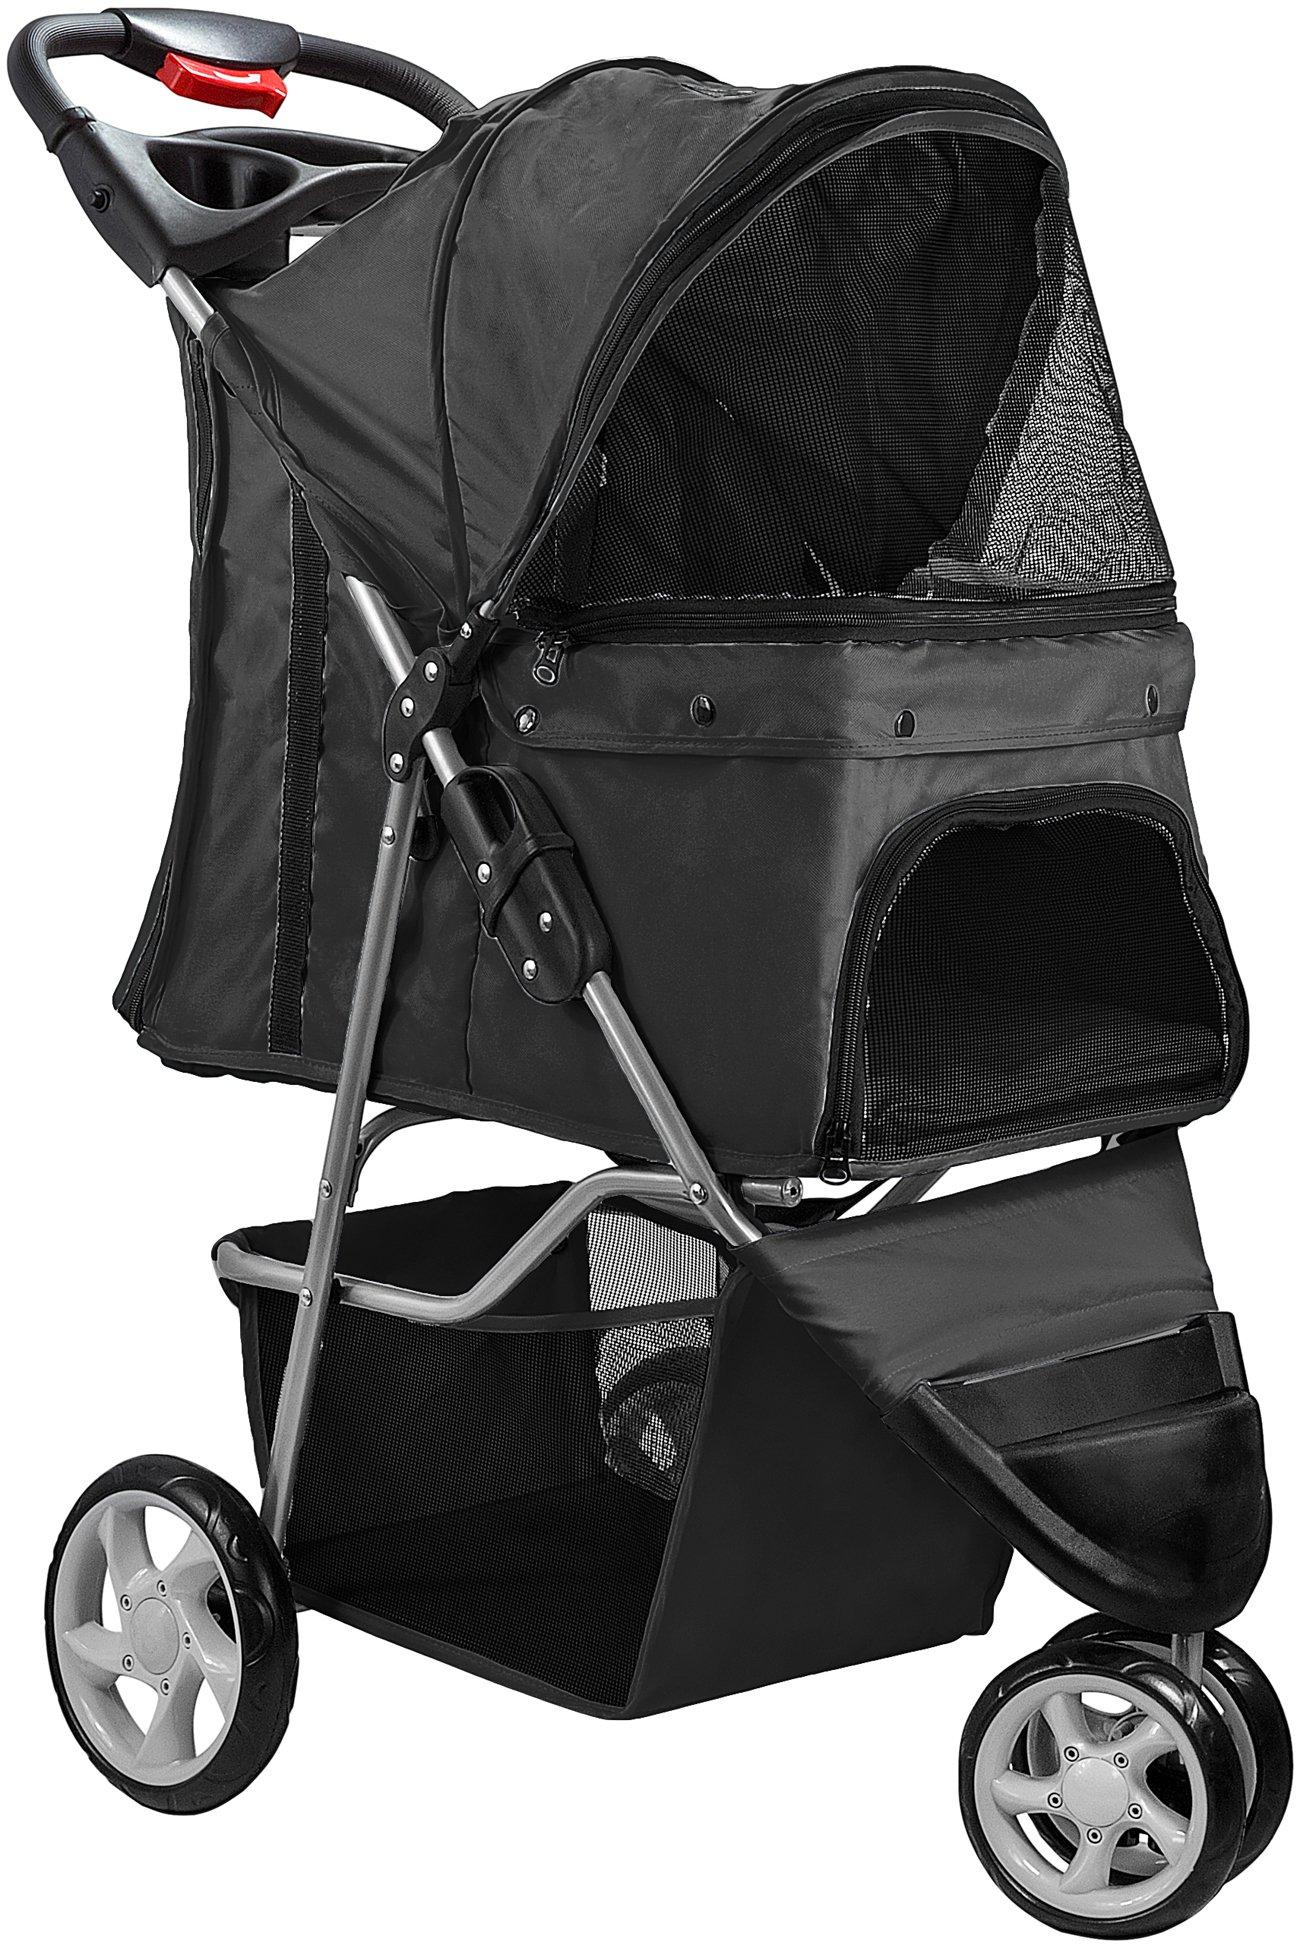 Paws & Pals 3 Wheeler Elite Jogger Pet Stroller Cat/Dog Easy Walk Folding Travel Carrier, Onyx Black